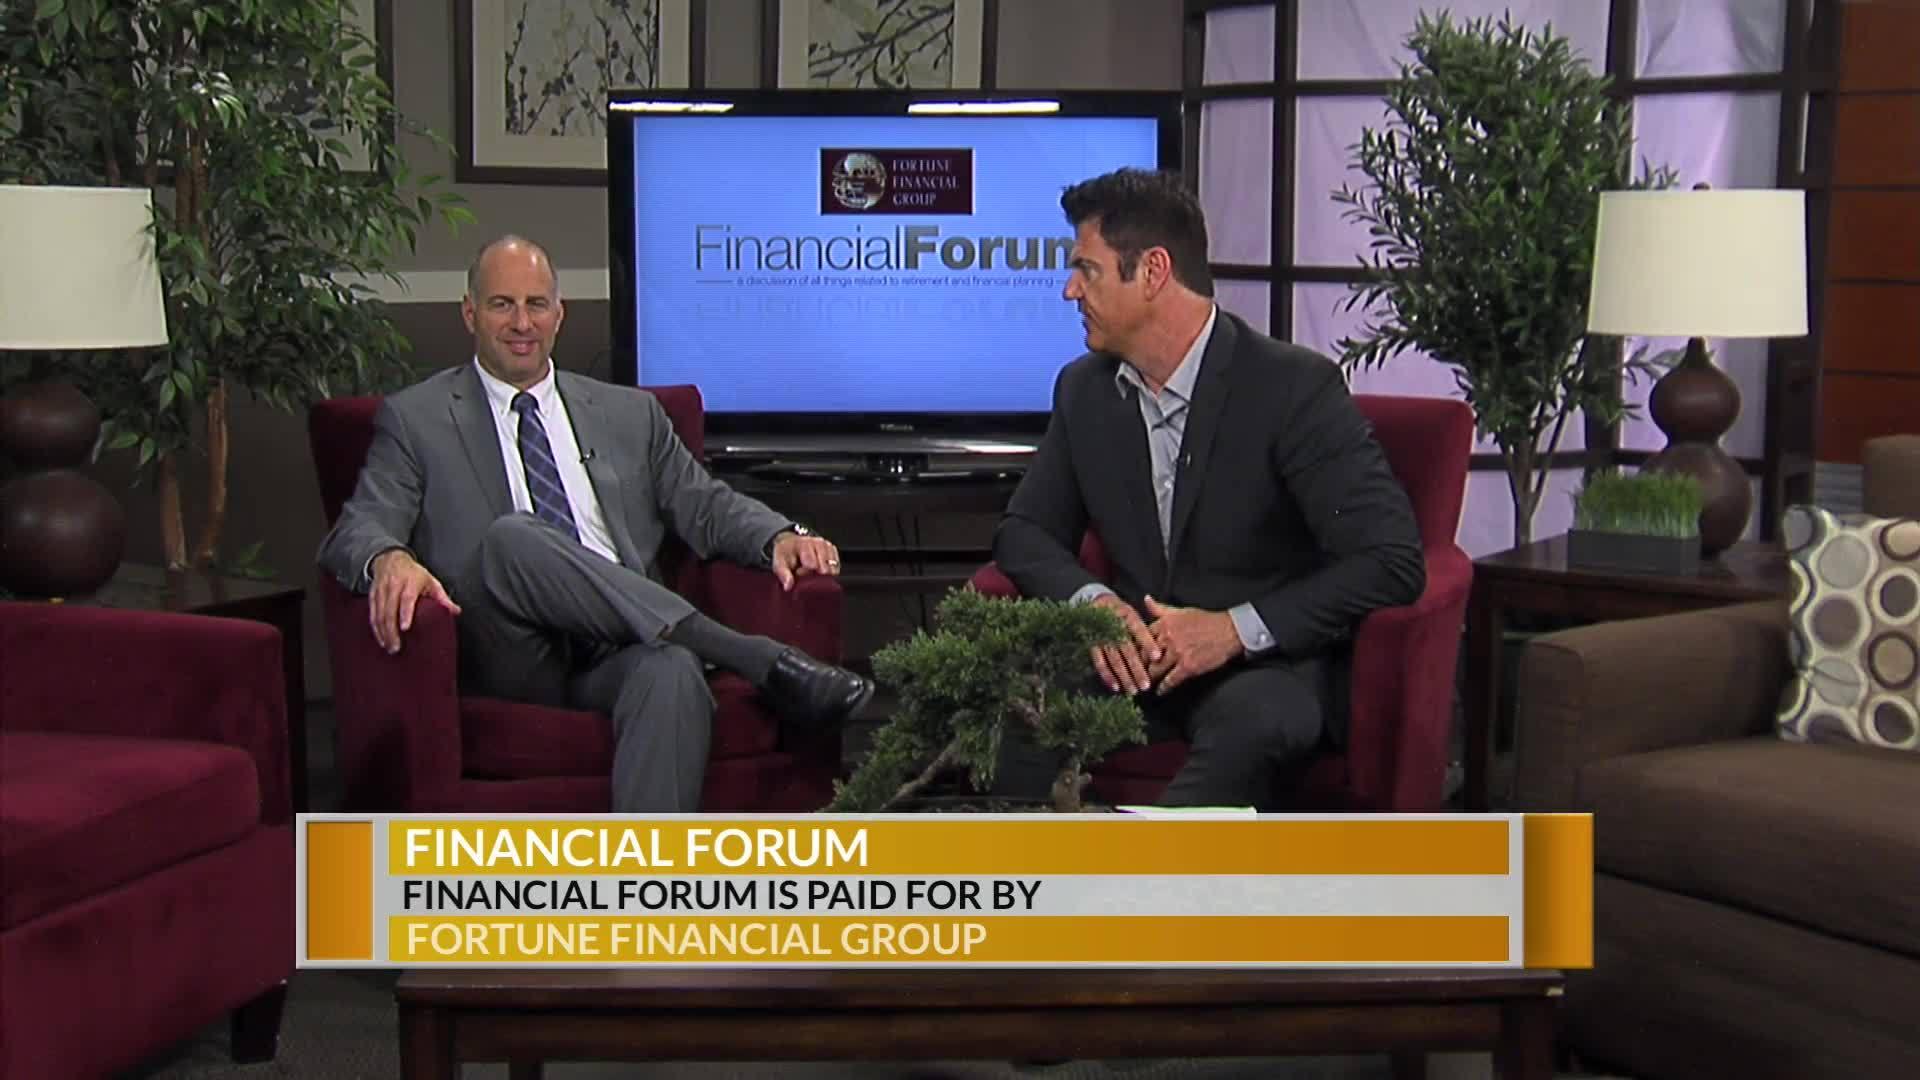 Financial_Forum_June_10__2019_2_20190425171309